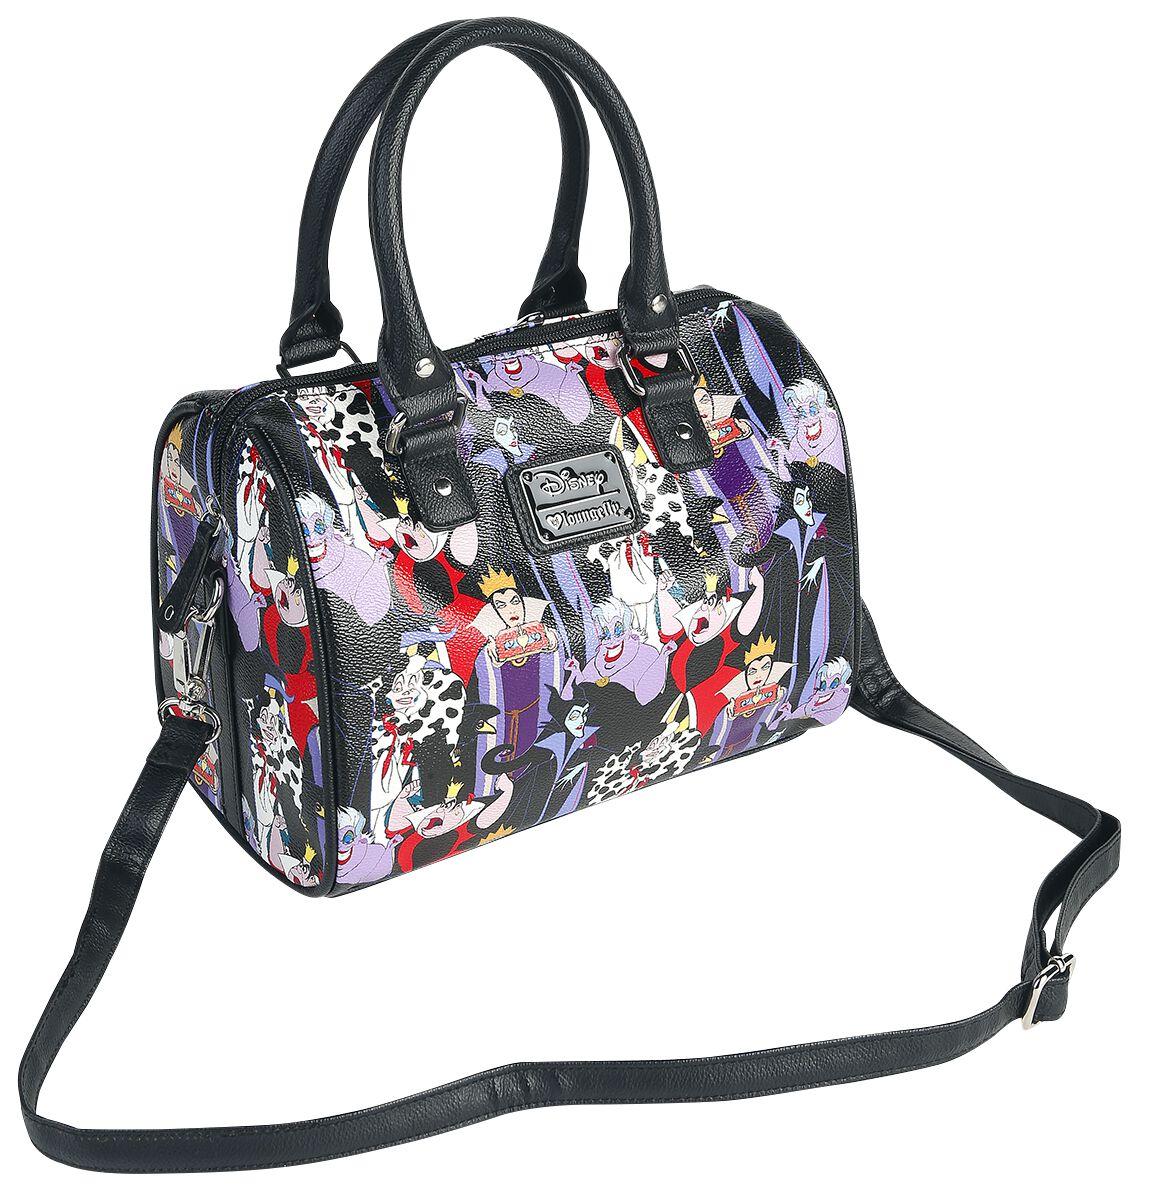 Merch dla Fanów - Torby i Plecaki - Torebka - Handbag Disney Villains Loungefly - Villains Torebka - Handbag wielokolorowy - 344303